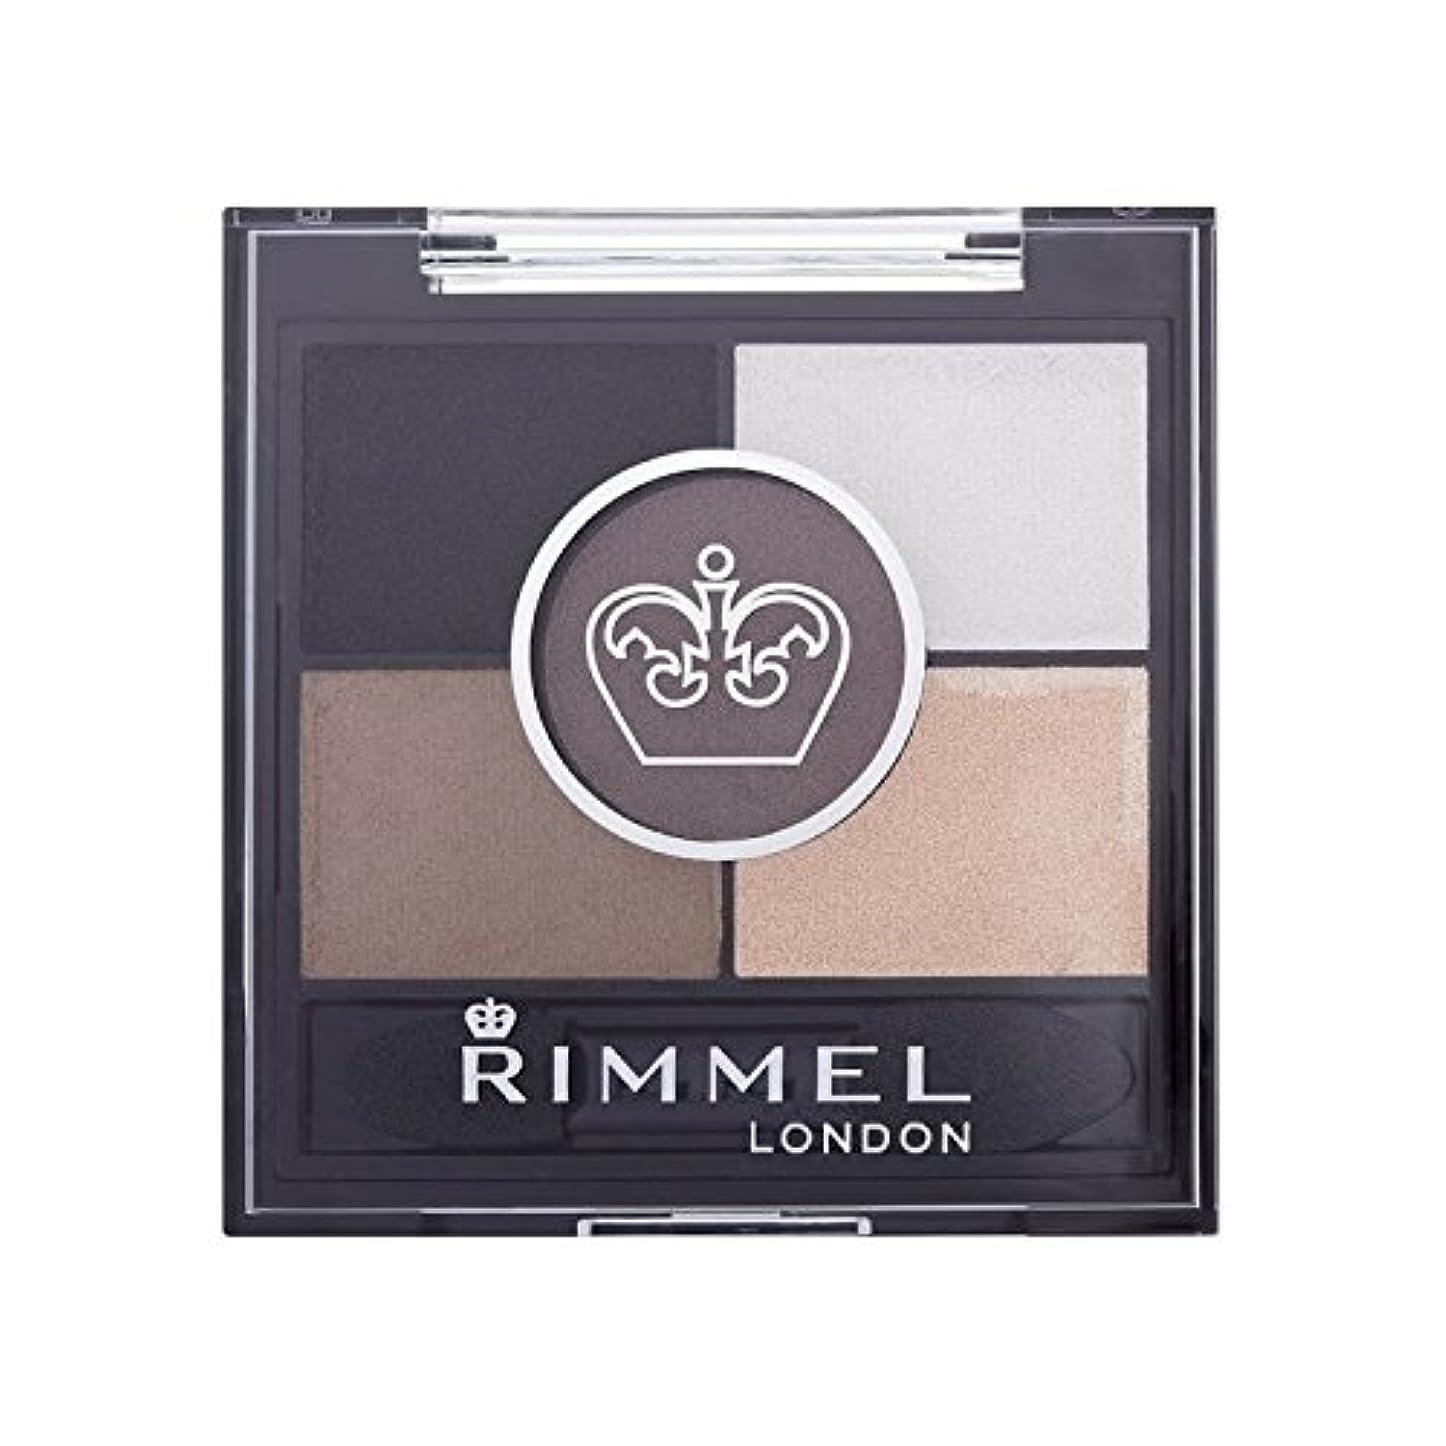 Rimmel 5 Pan Eyeshadow Foggy Grey - リンメル5パンアイシャドウ霧グレー [並行輸入品]